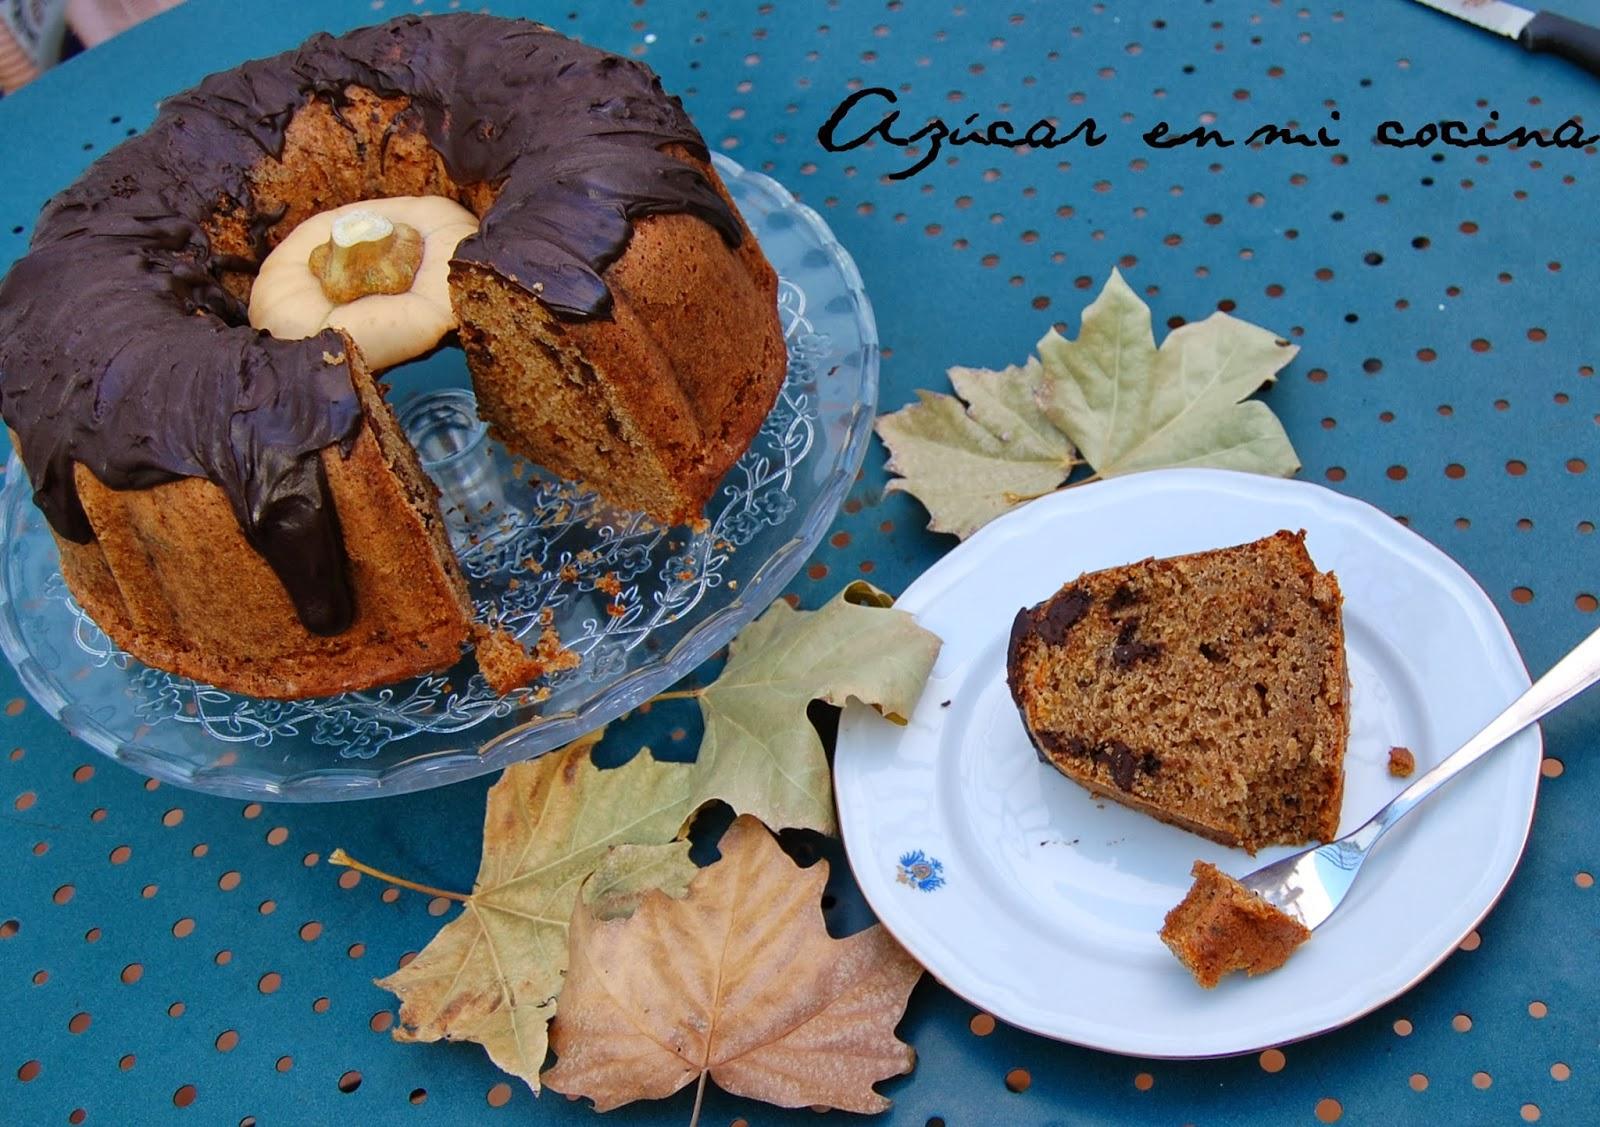 http://azucarenmicocina.blogspot.com.es/2013/11/pumpkin-bundt-cake.html